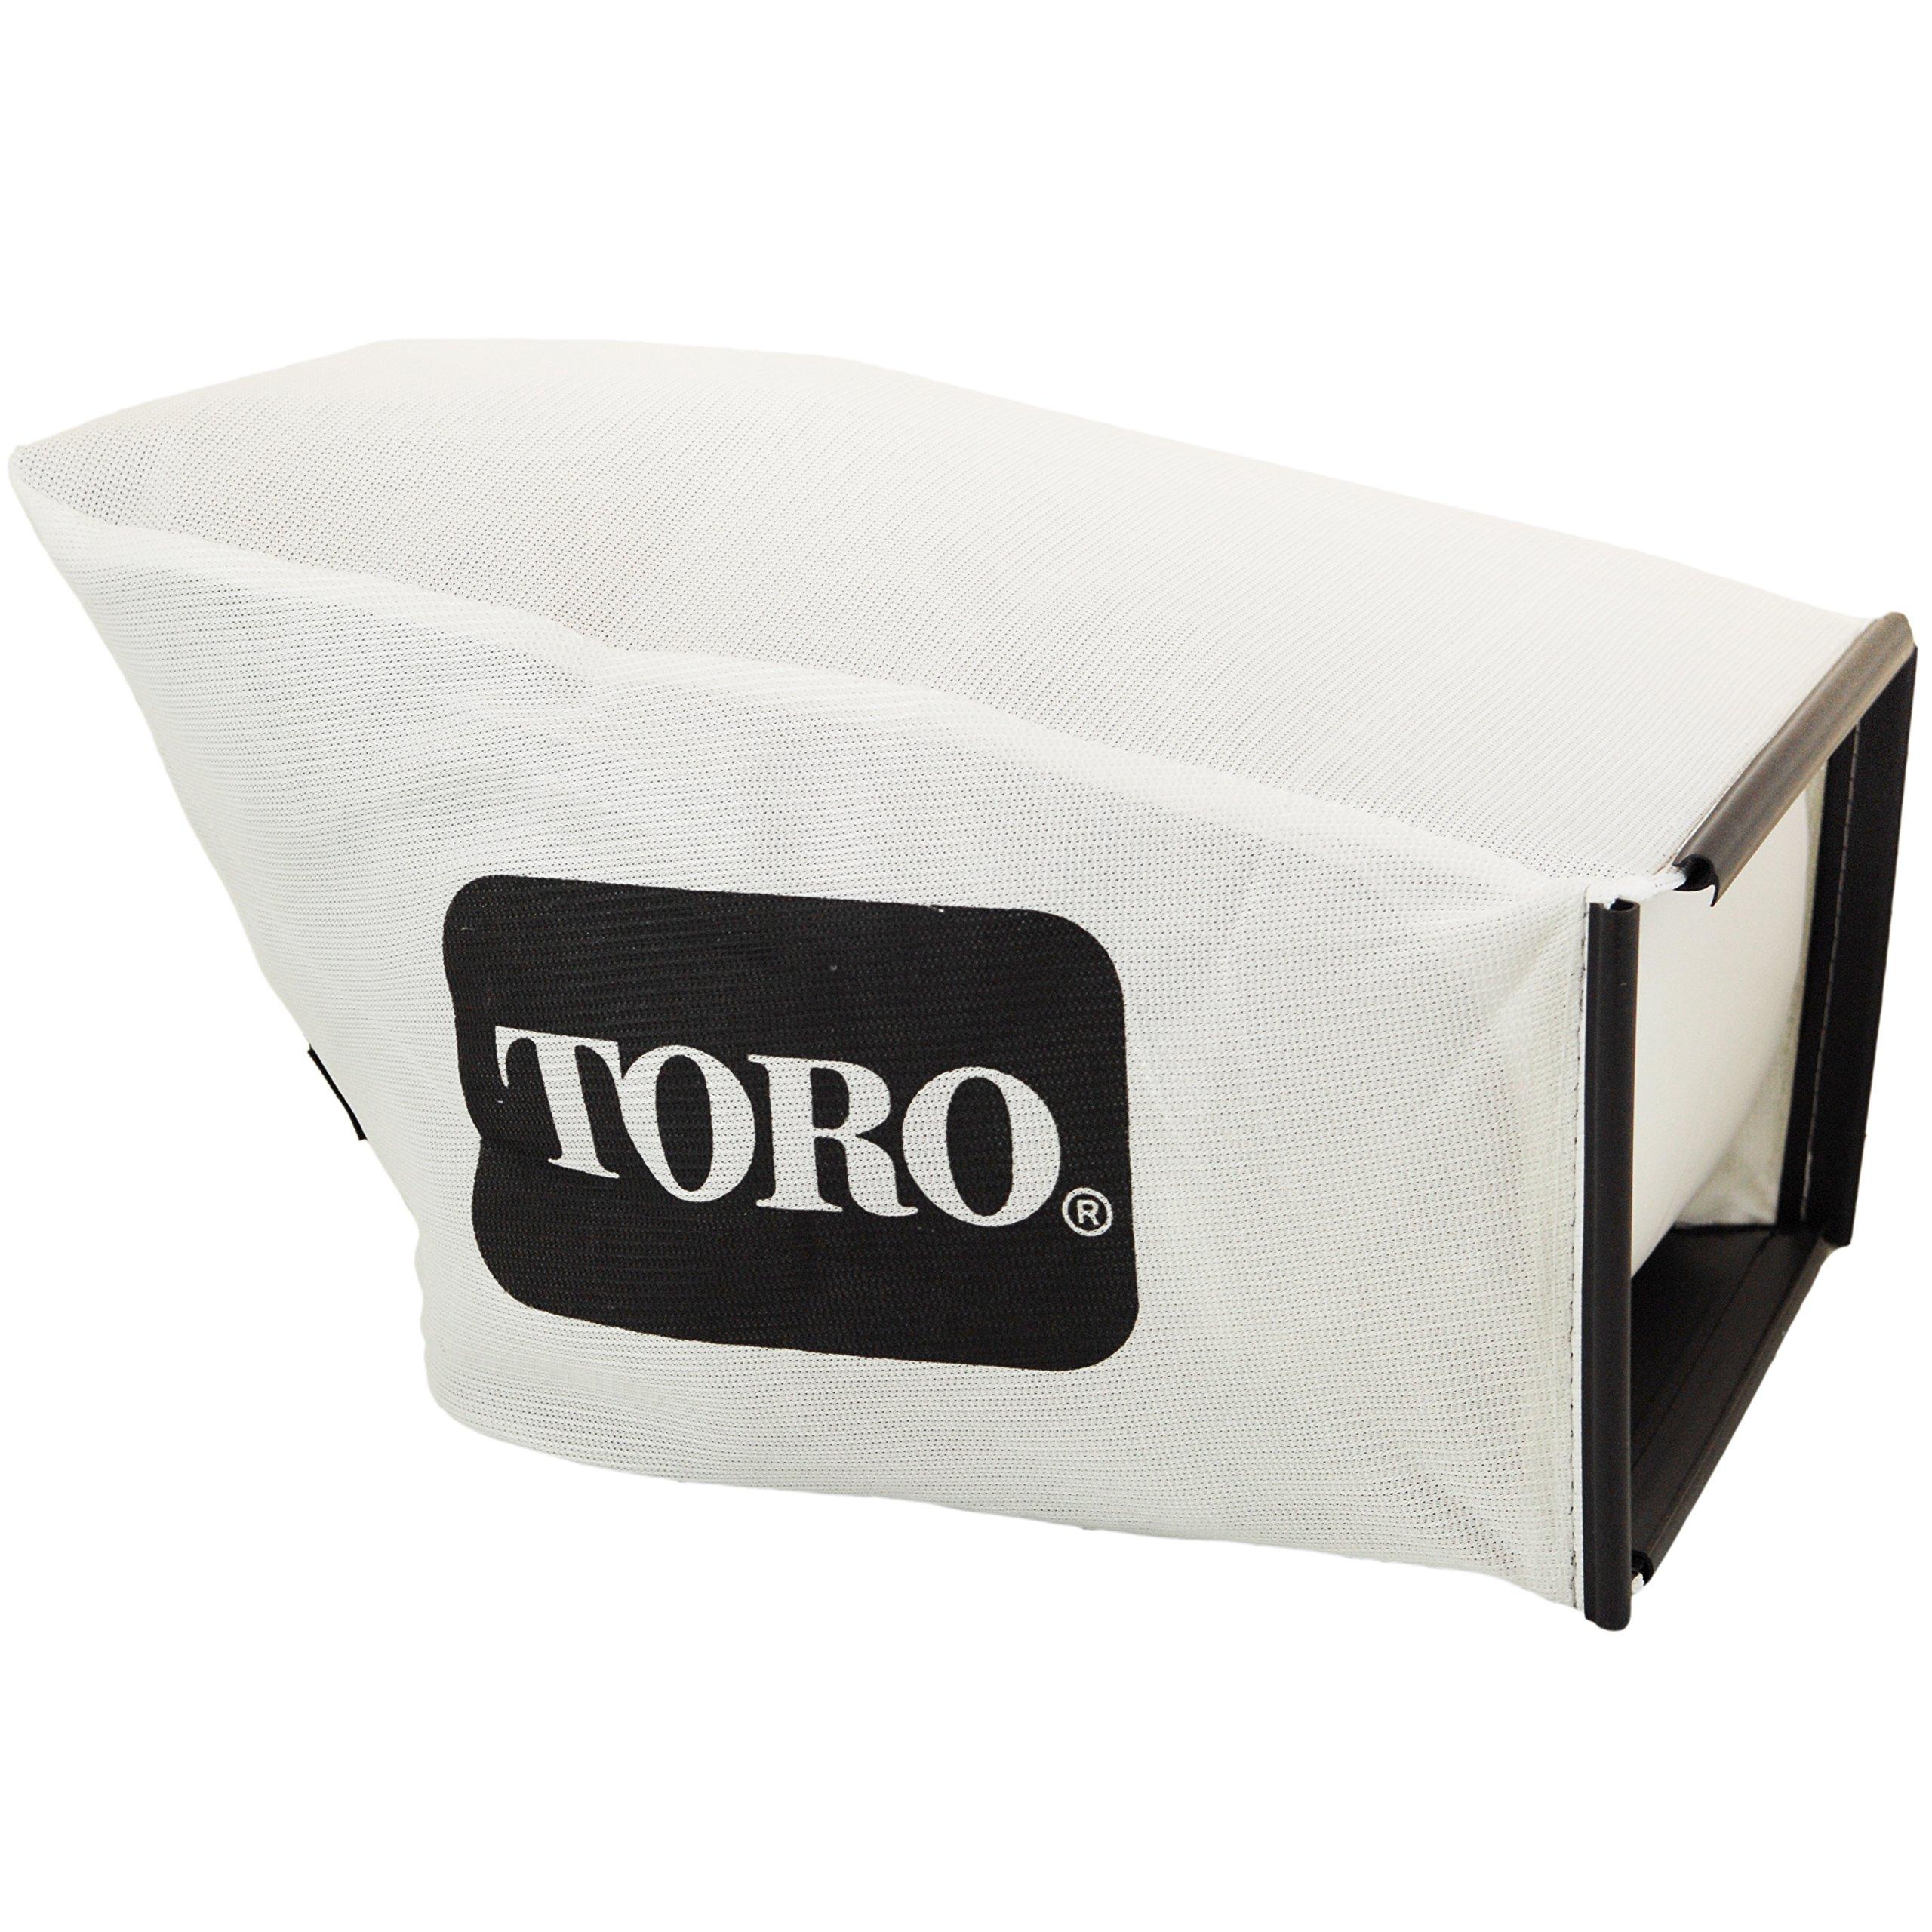 Toro 115-4673 Grass Bag Assembly